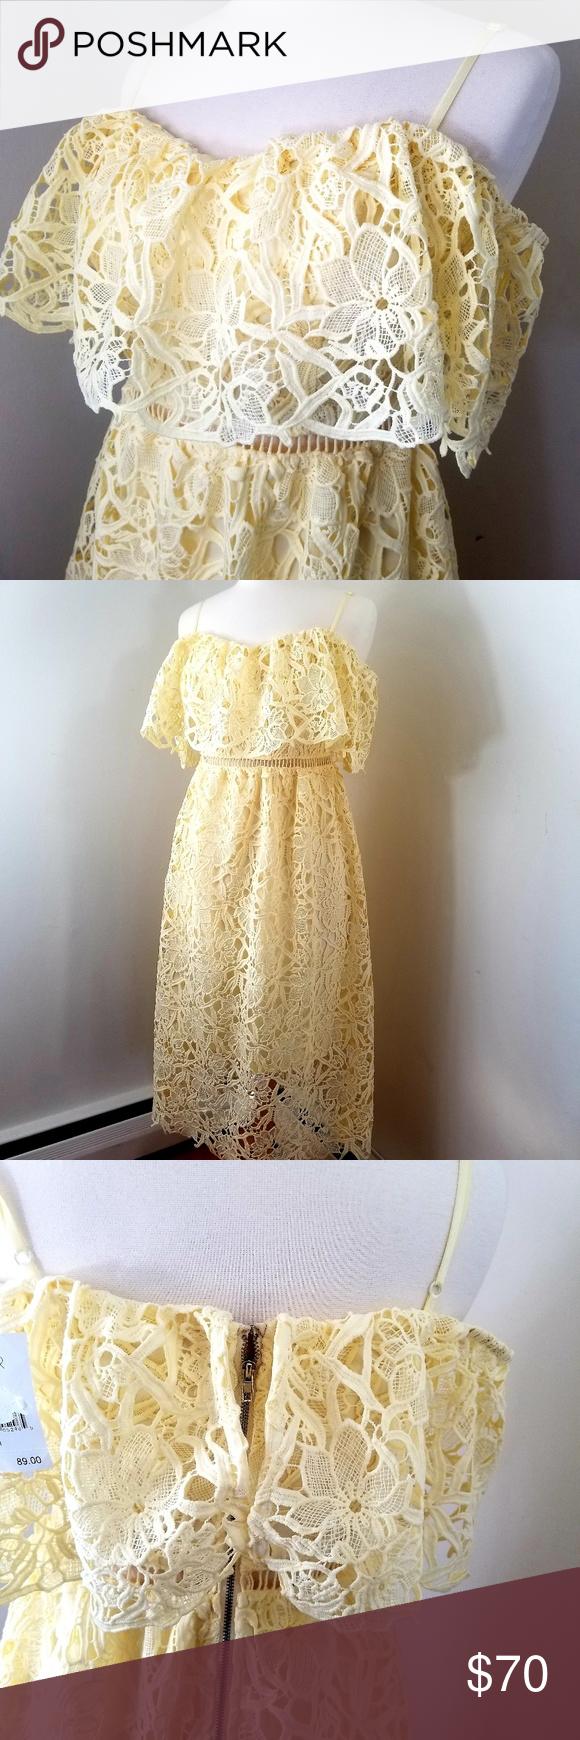 ASTR lace dress NWT New feminine and flirty ASTR the label peekaboo lace dress f…